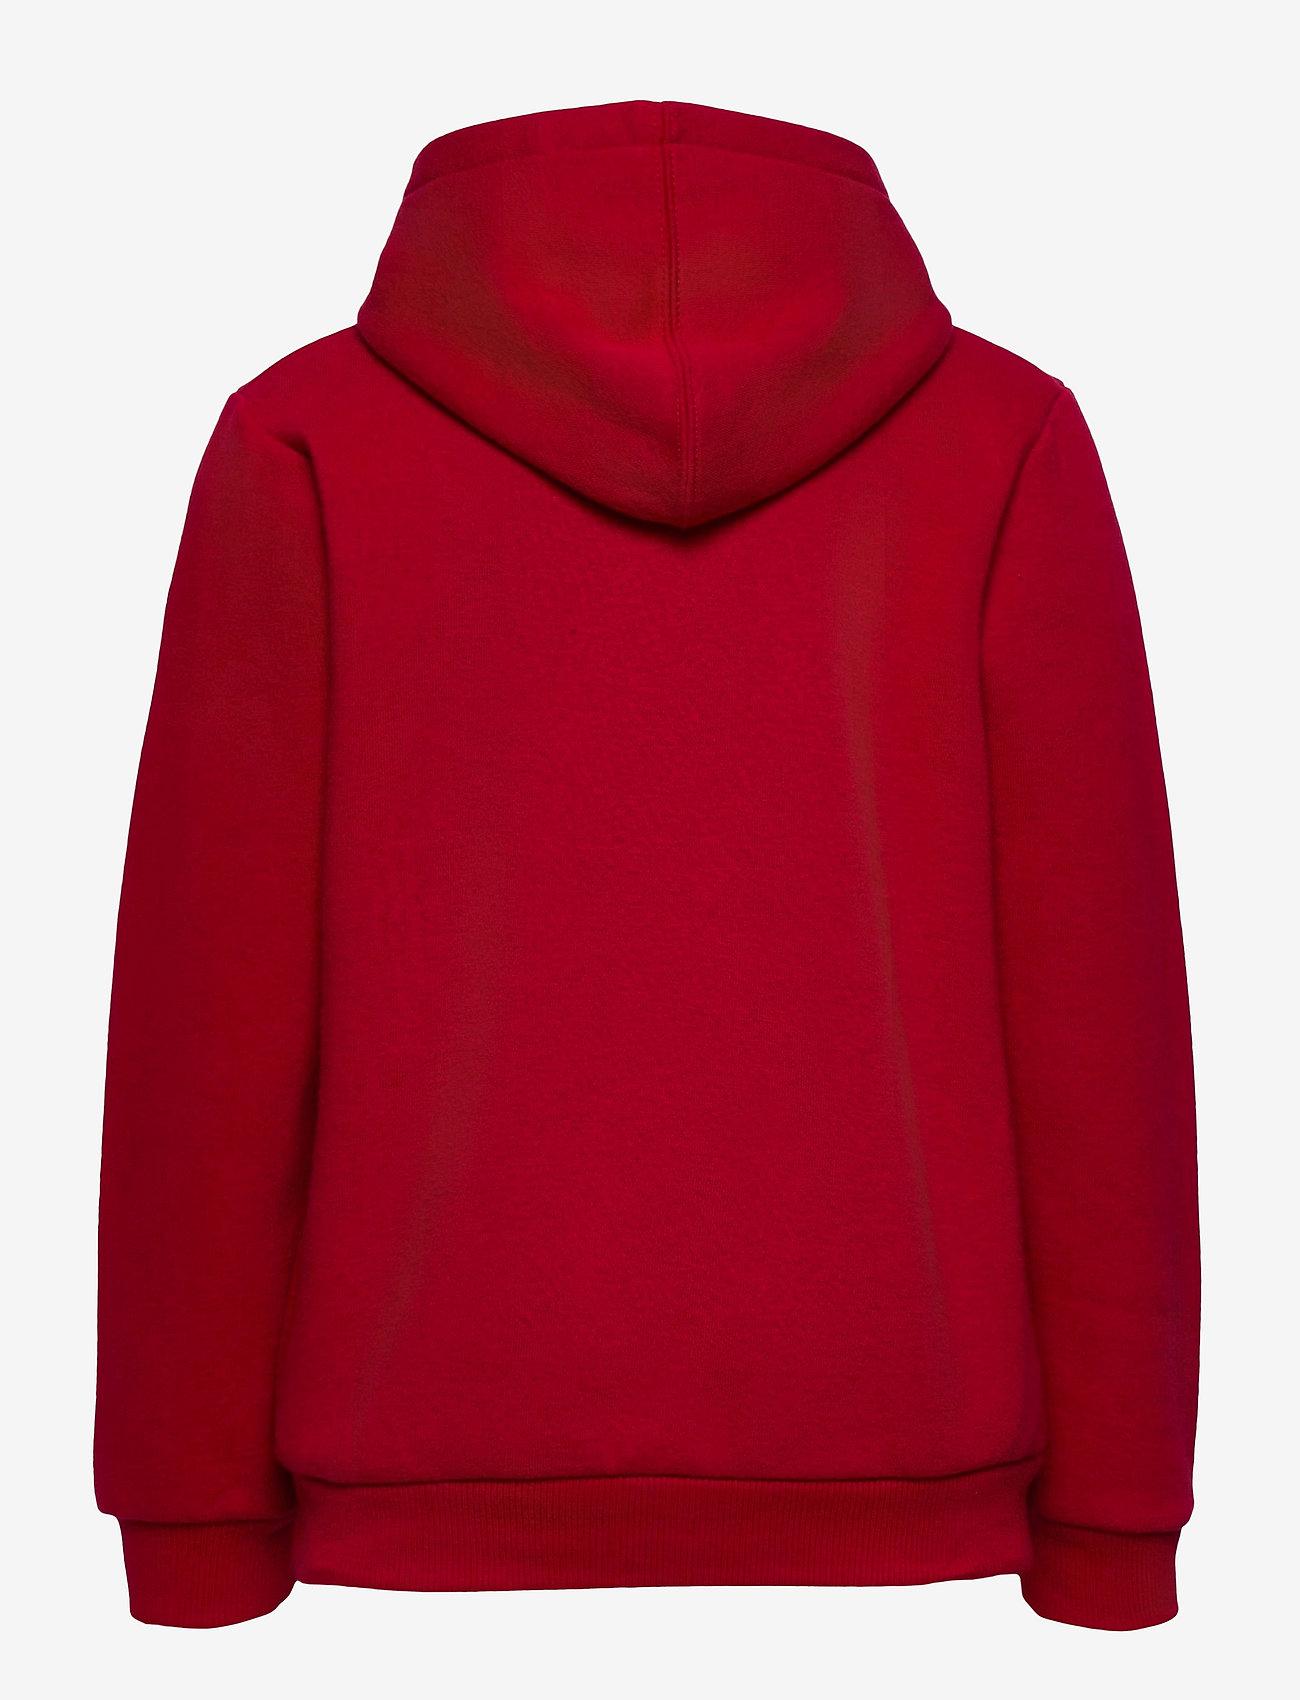 Levi's - SWEAT SHIRT - kapuzenpullover - levis red/ white - 1